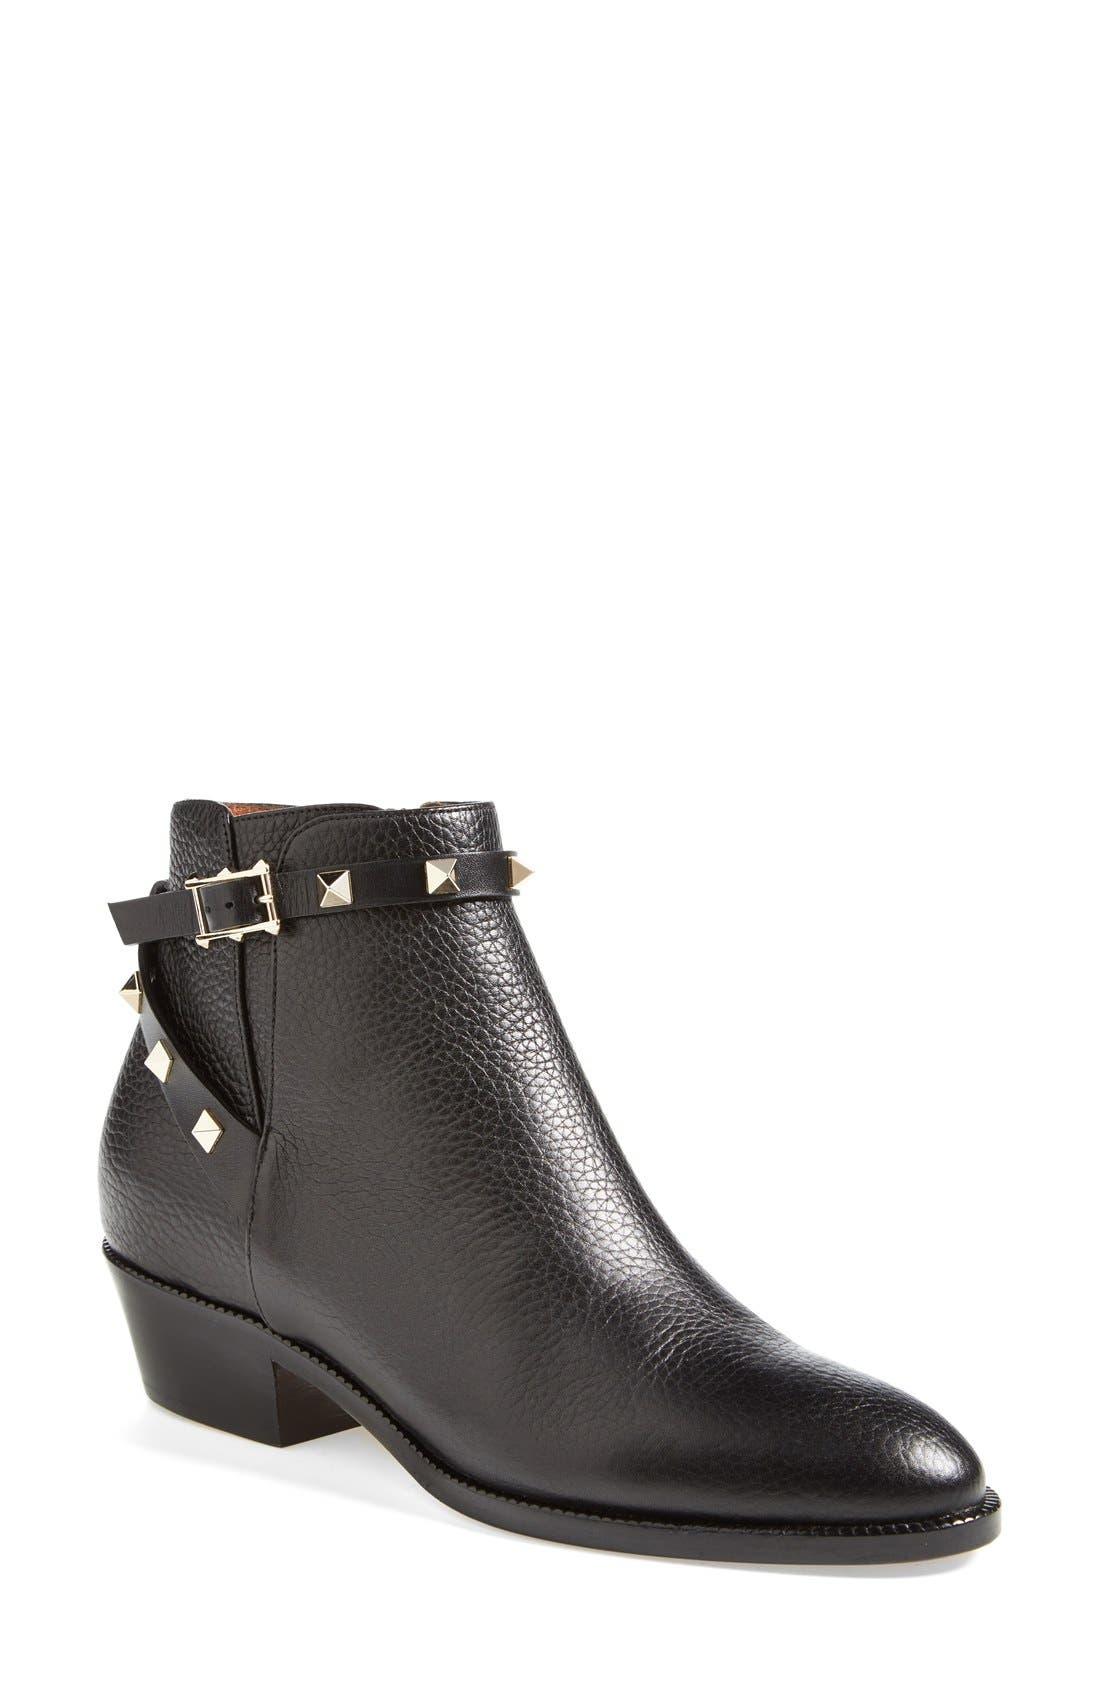 Main Image - VALENTINO GARAVANI 'Rockstud' Ankle Boot (Women)